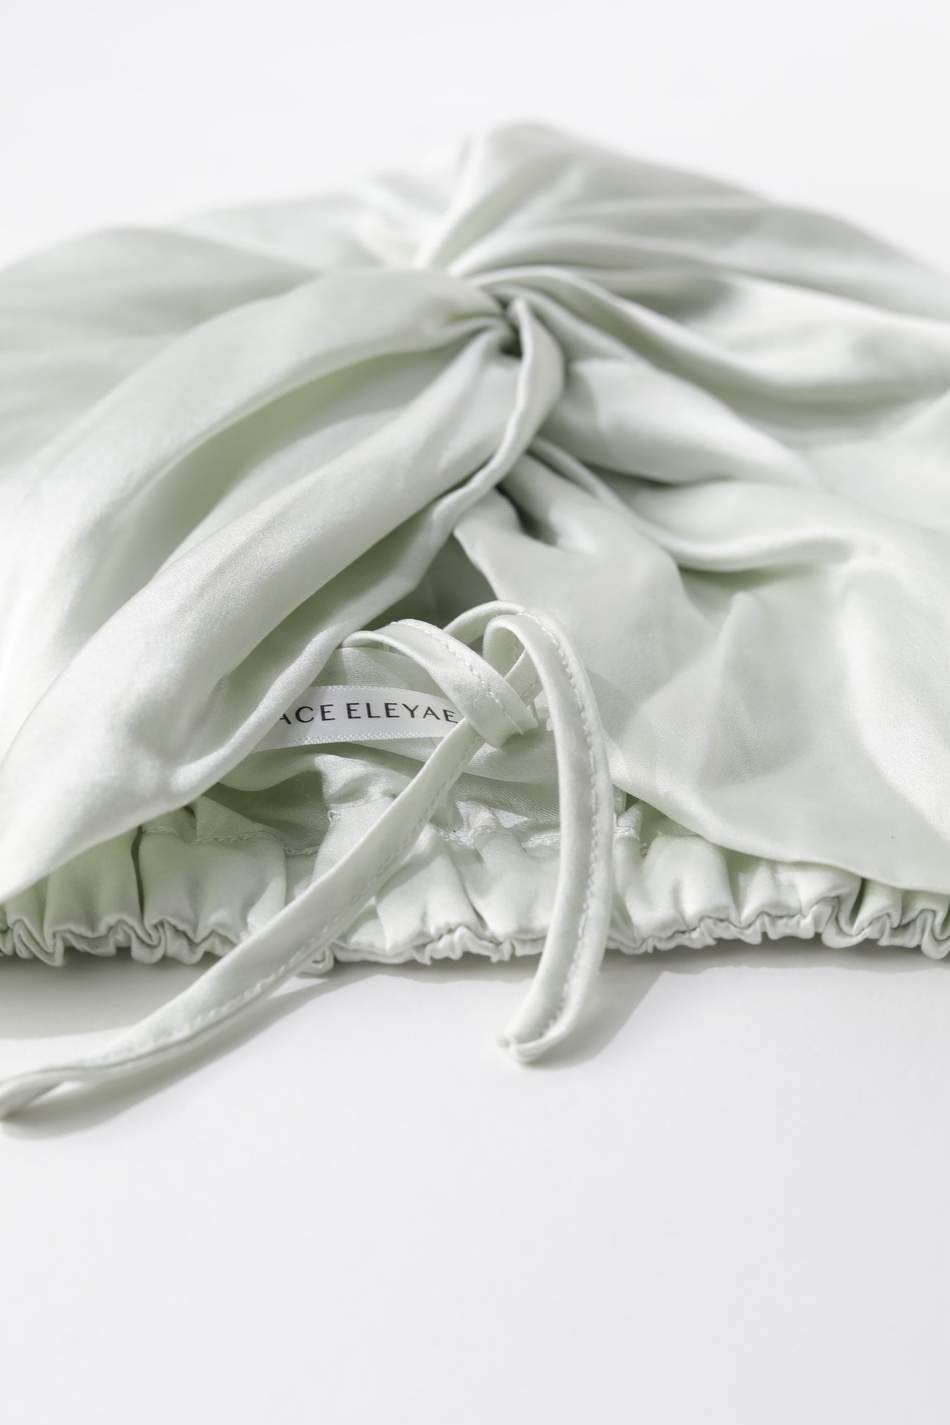 Grace Eleyae Silk Twist Turban